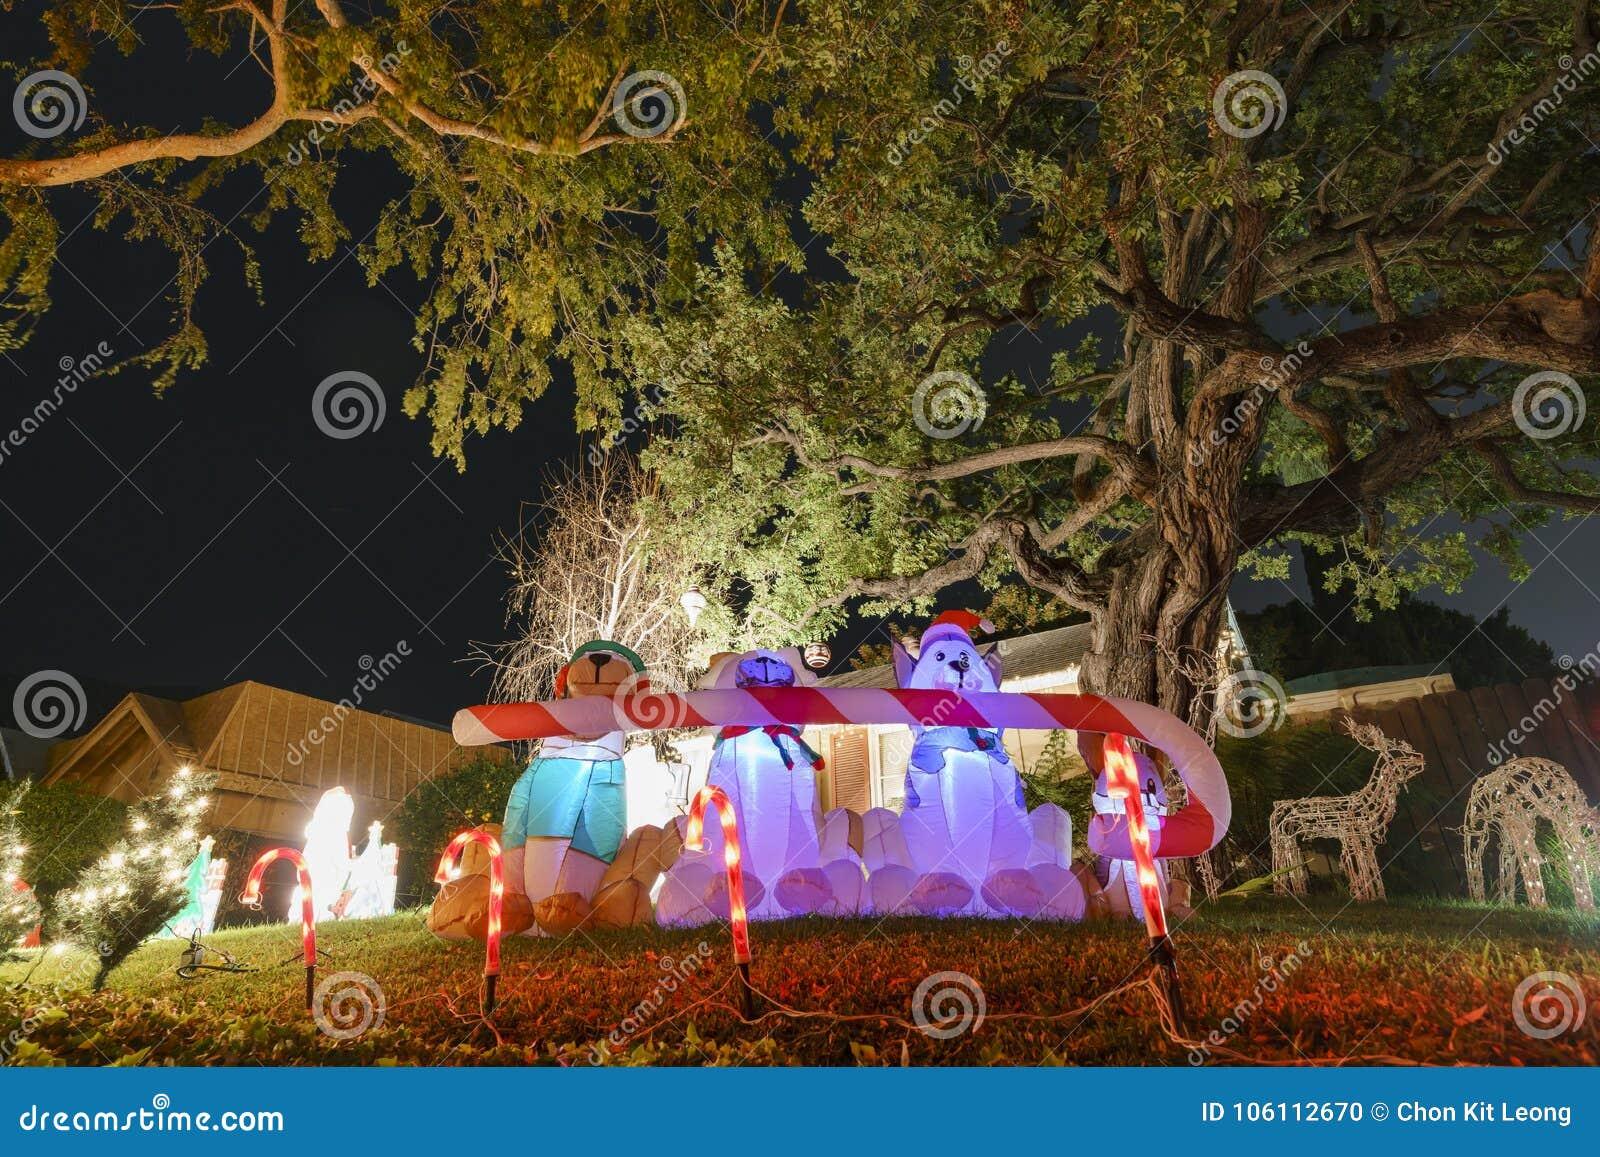 download beautiful christmas lights in upper hastings ranch neighborhood stock photo image of lights